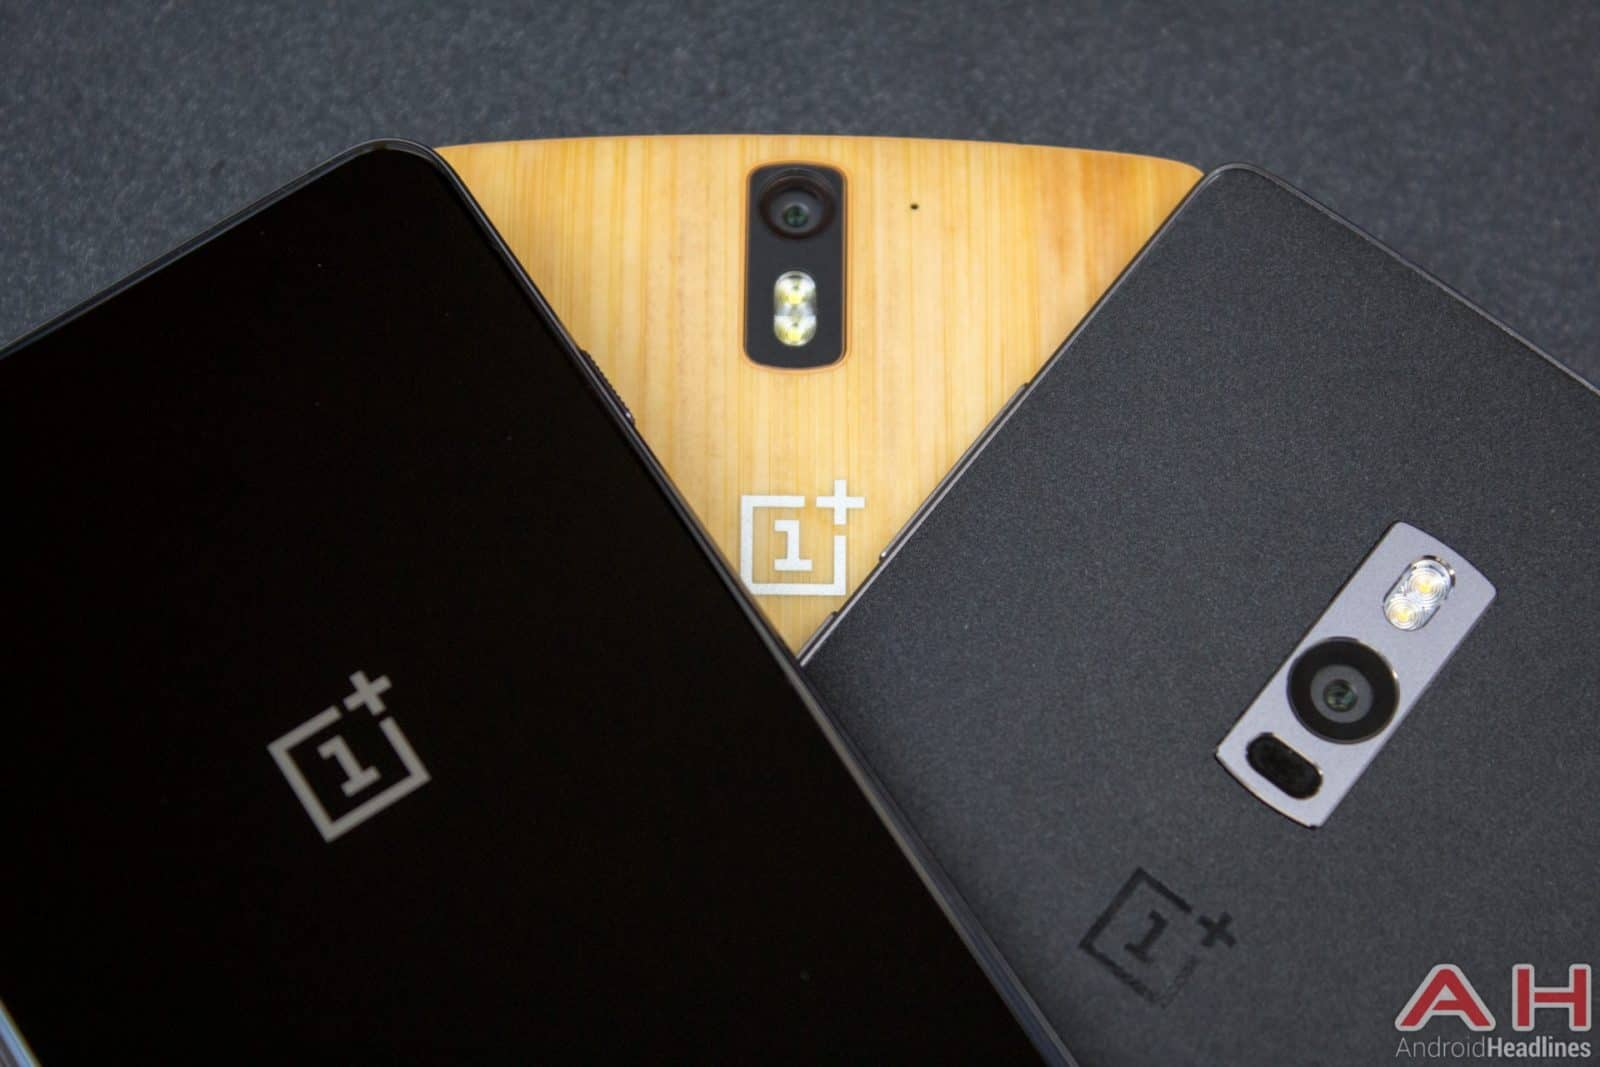 OnePlus All Phones